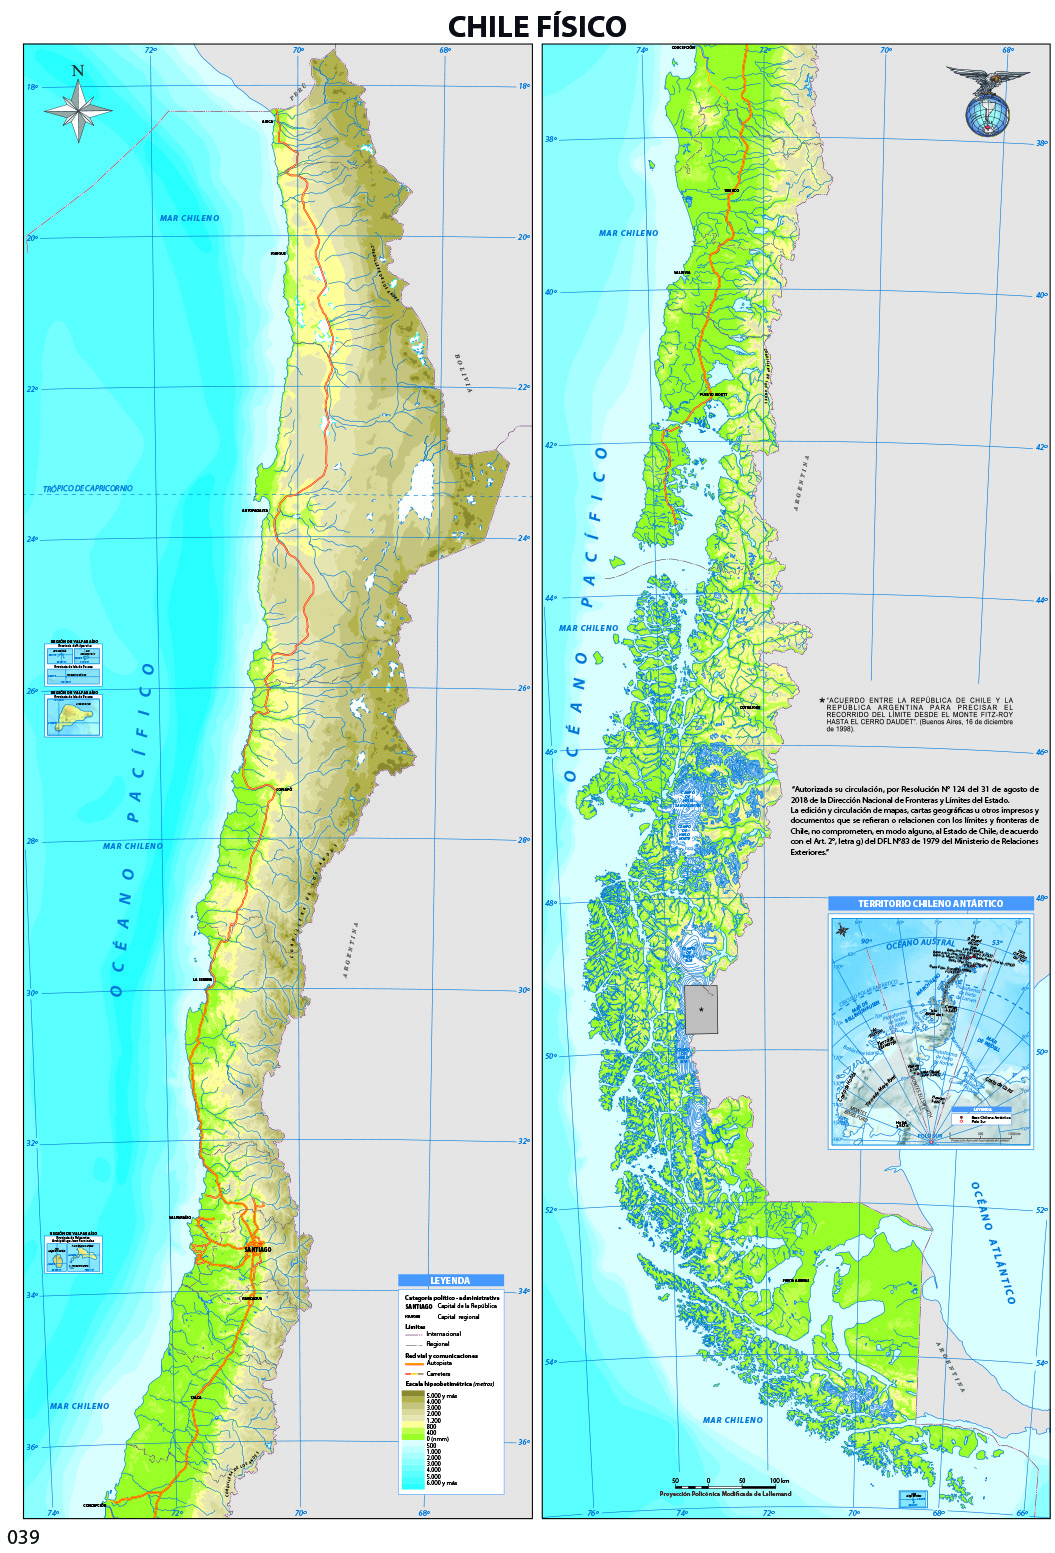 Mapa Con El Relieve De Chile Curriculum Nacional Mineduc Chile